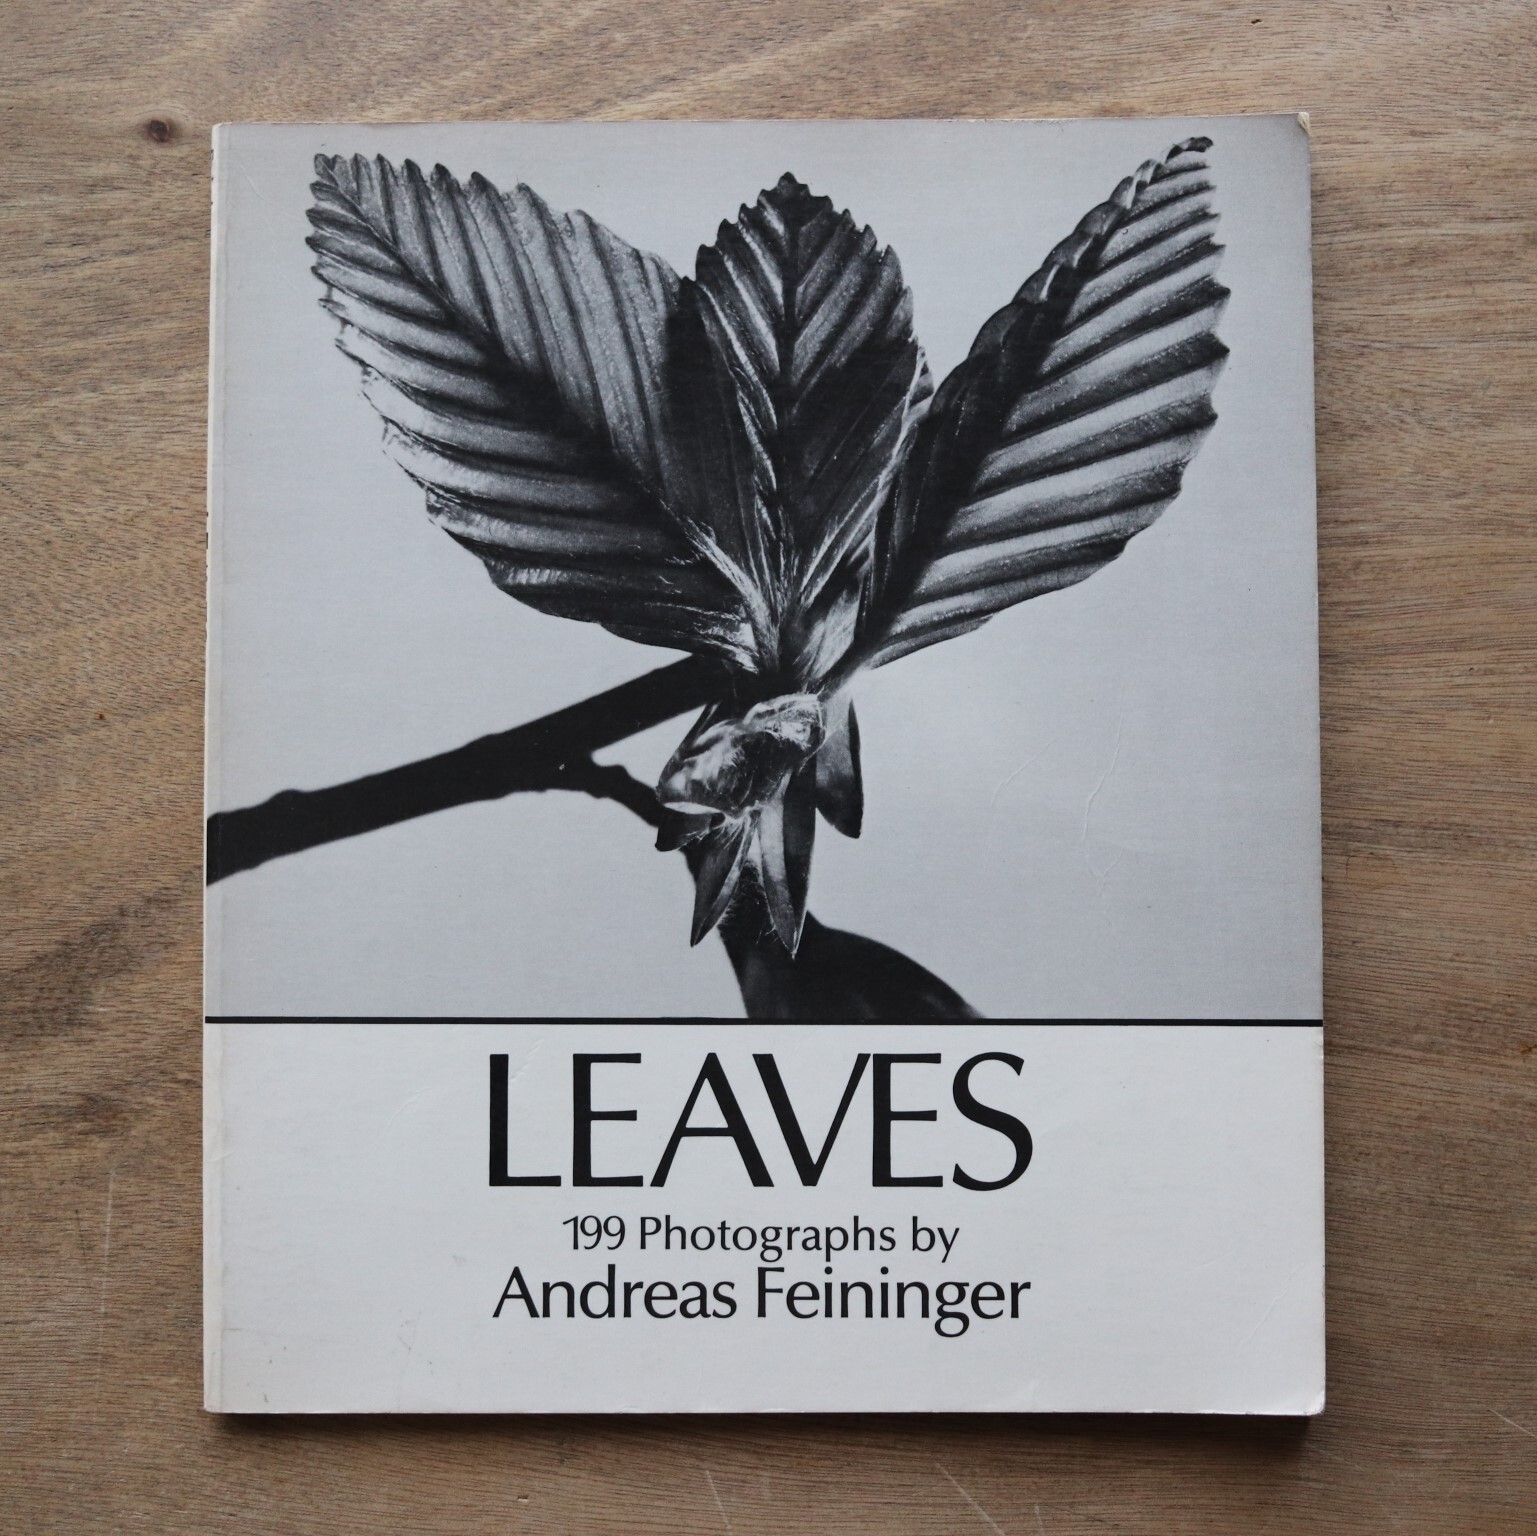 Leaves: 199 photographs / Andreas Feininger / アンドレアス・ファイニンガー